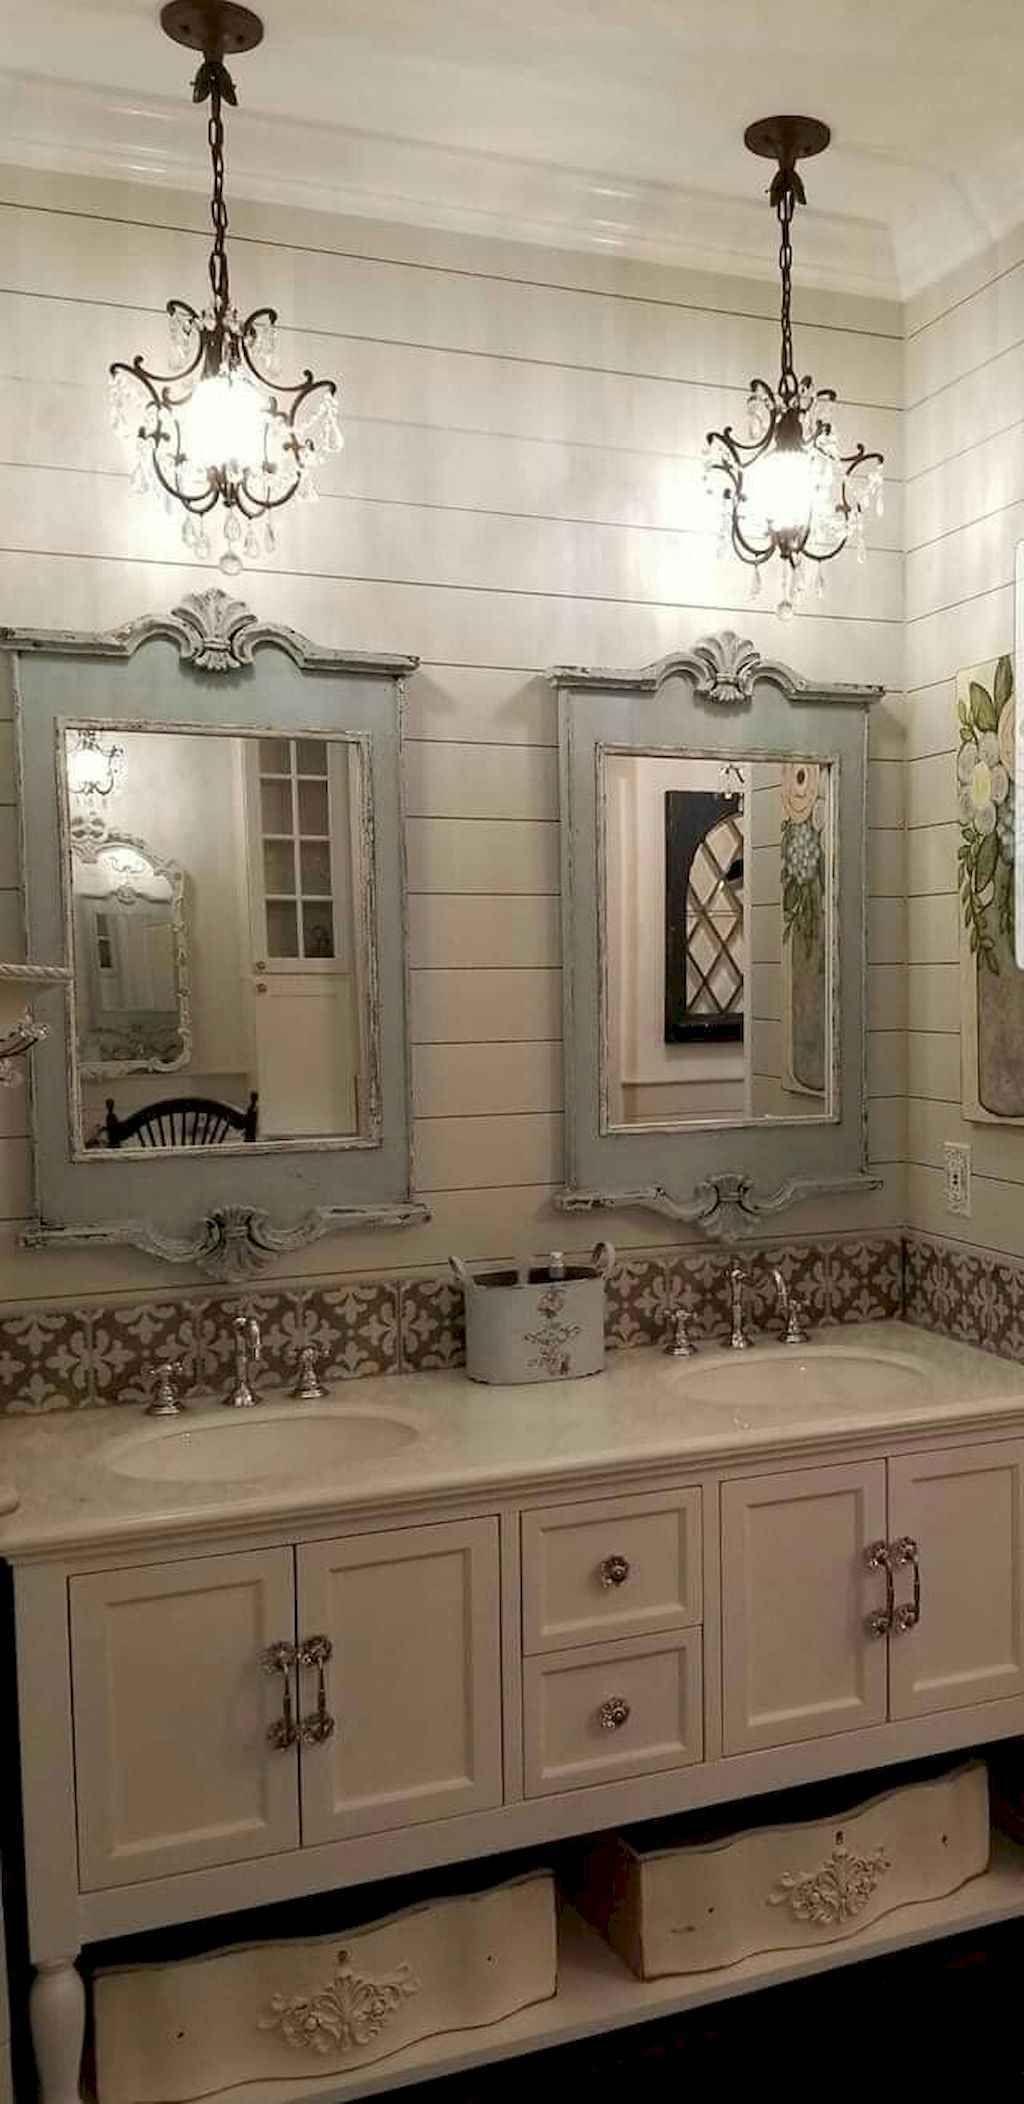 54 rustic farmhouse bathroom remodel ideas in 2020  dream